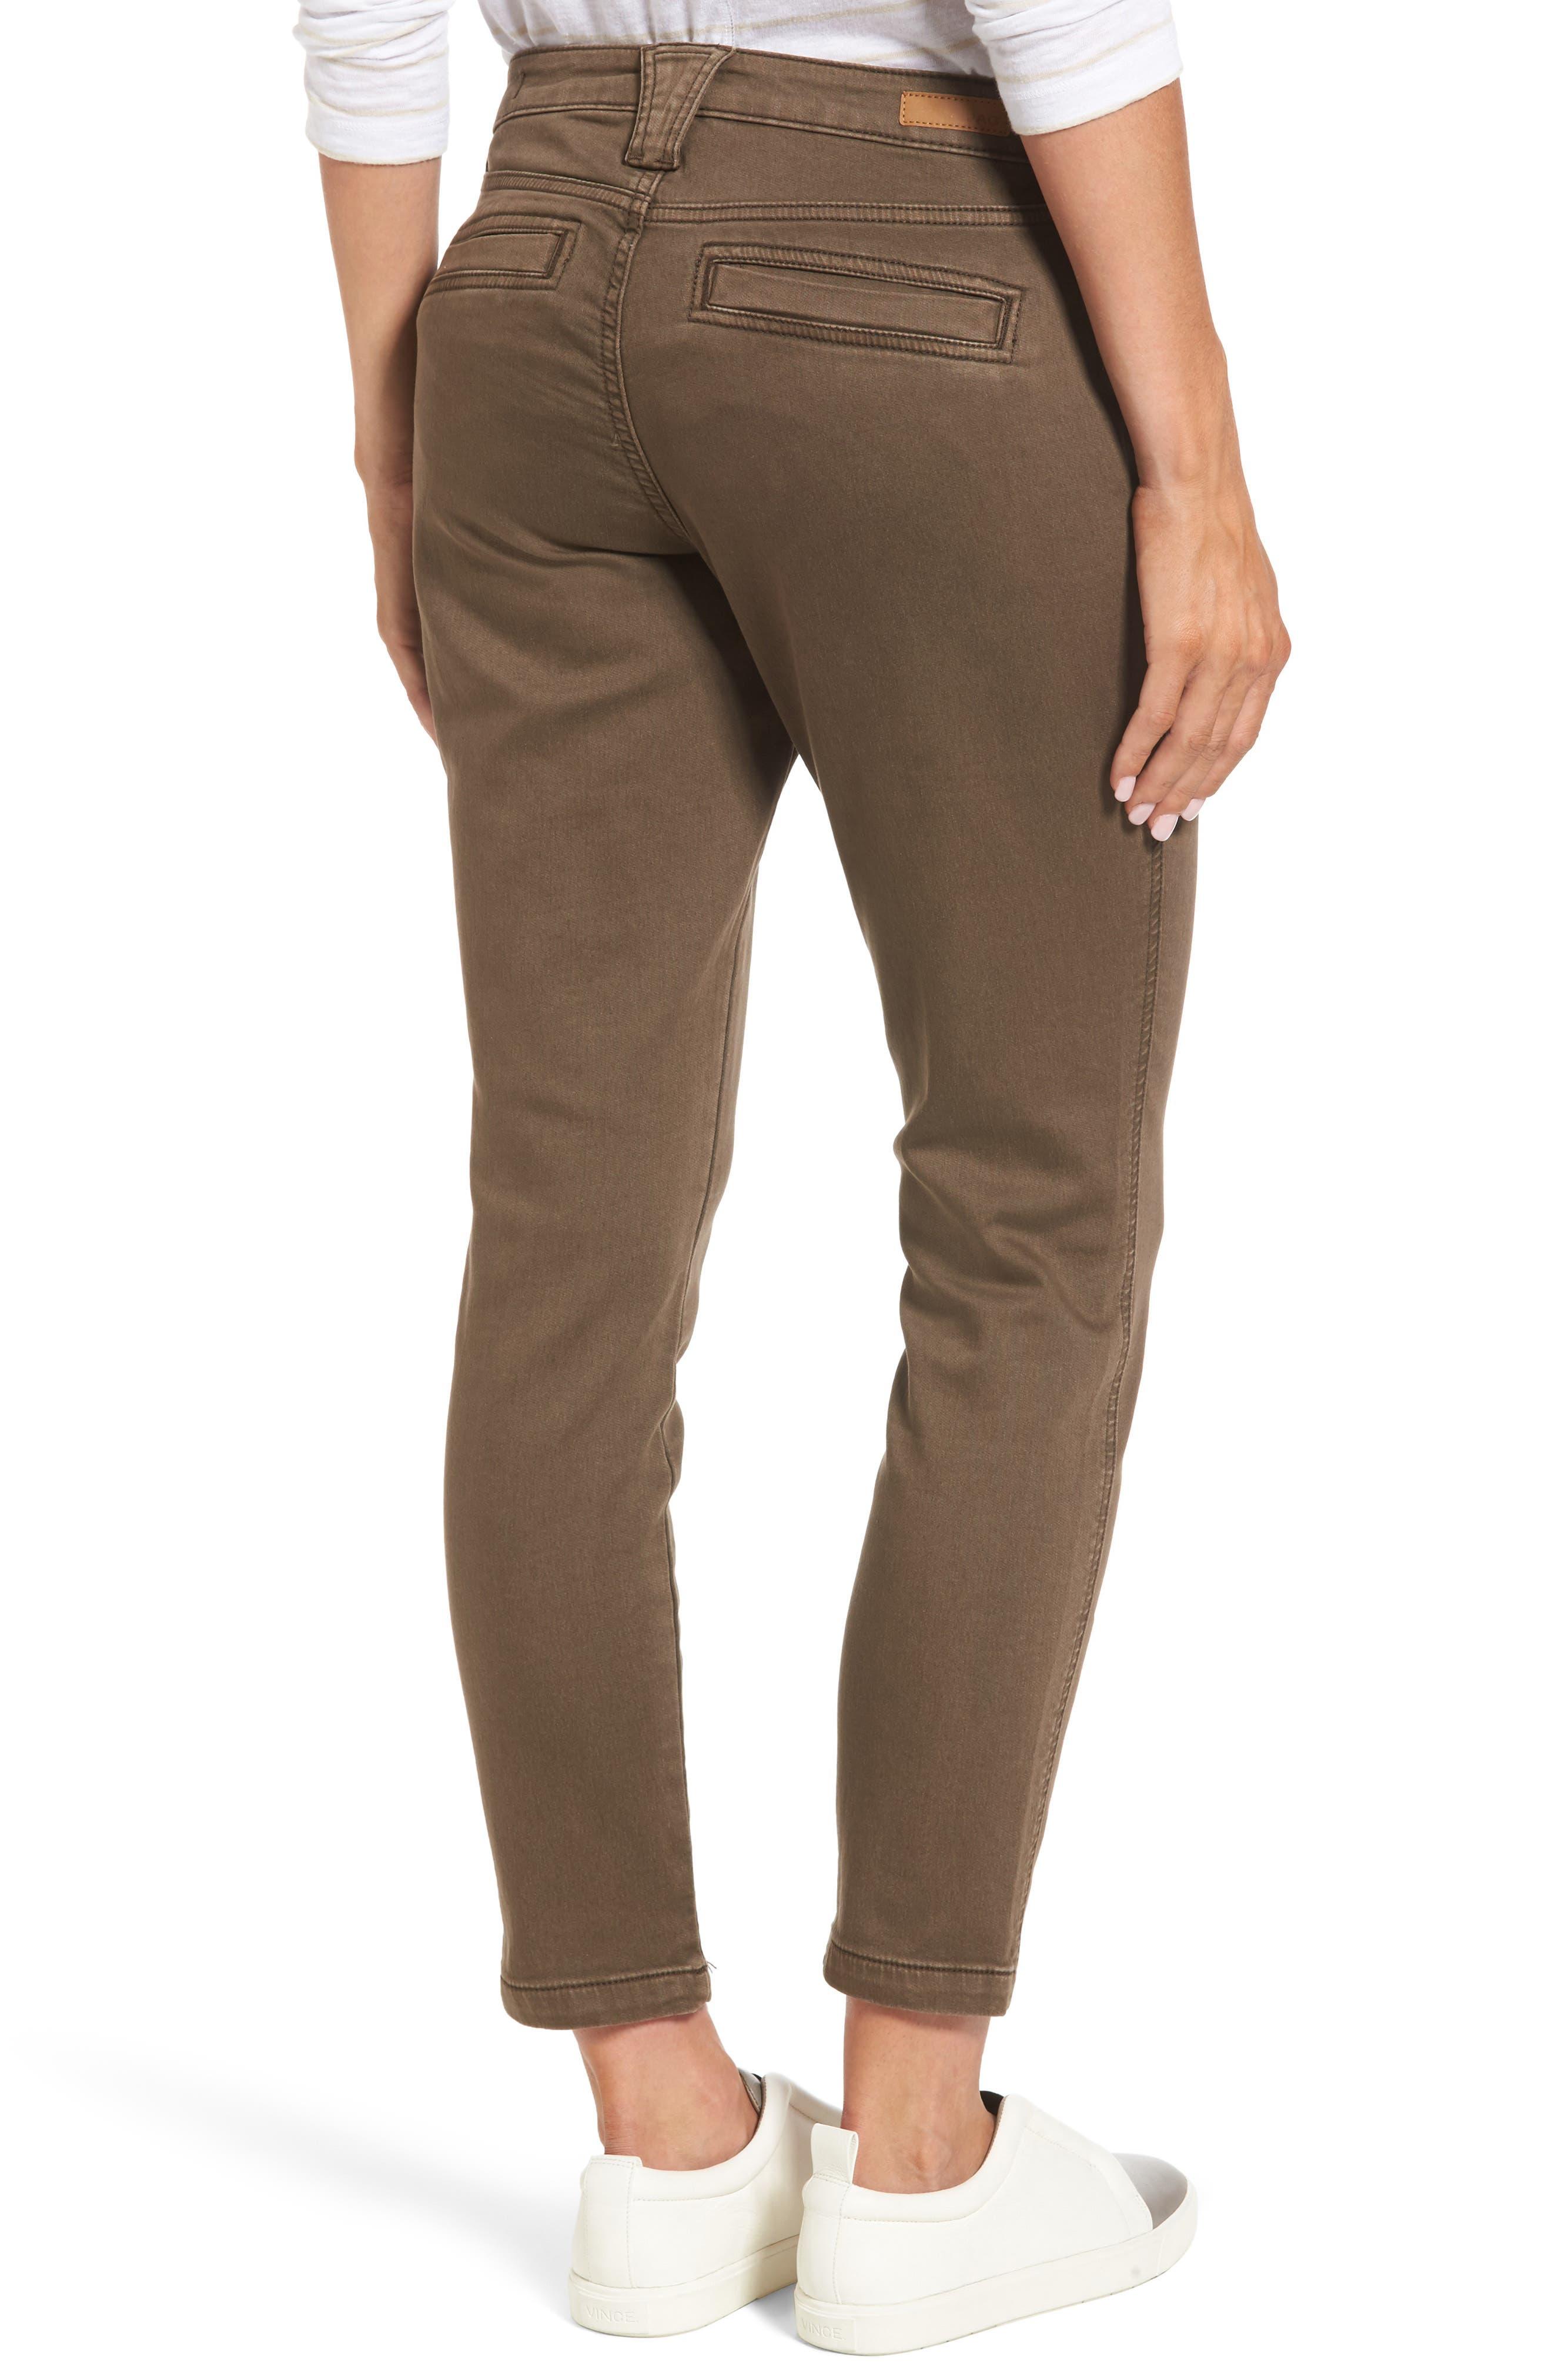 Ryan Knit Skinny Jeans,                             Alternate thumbnail 2, color,                             205